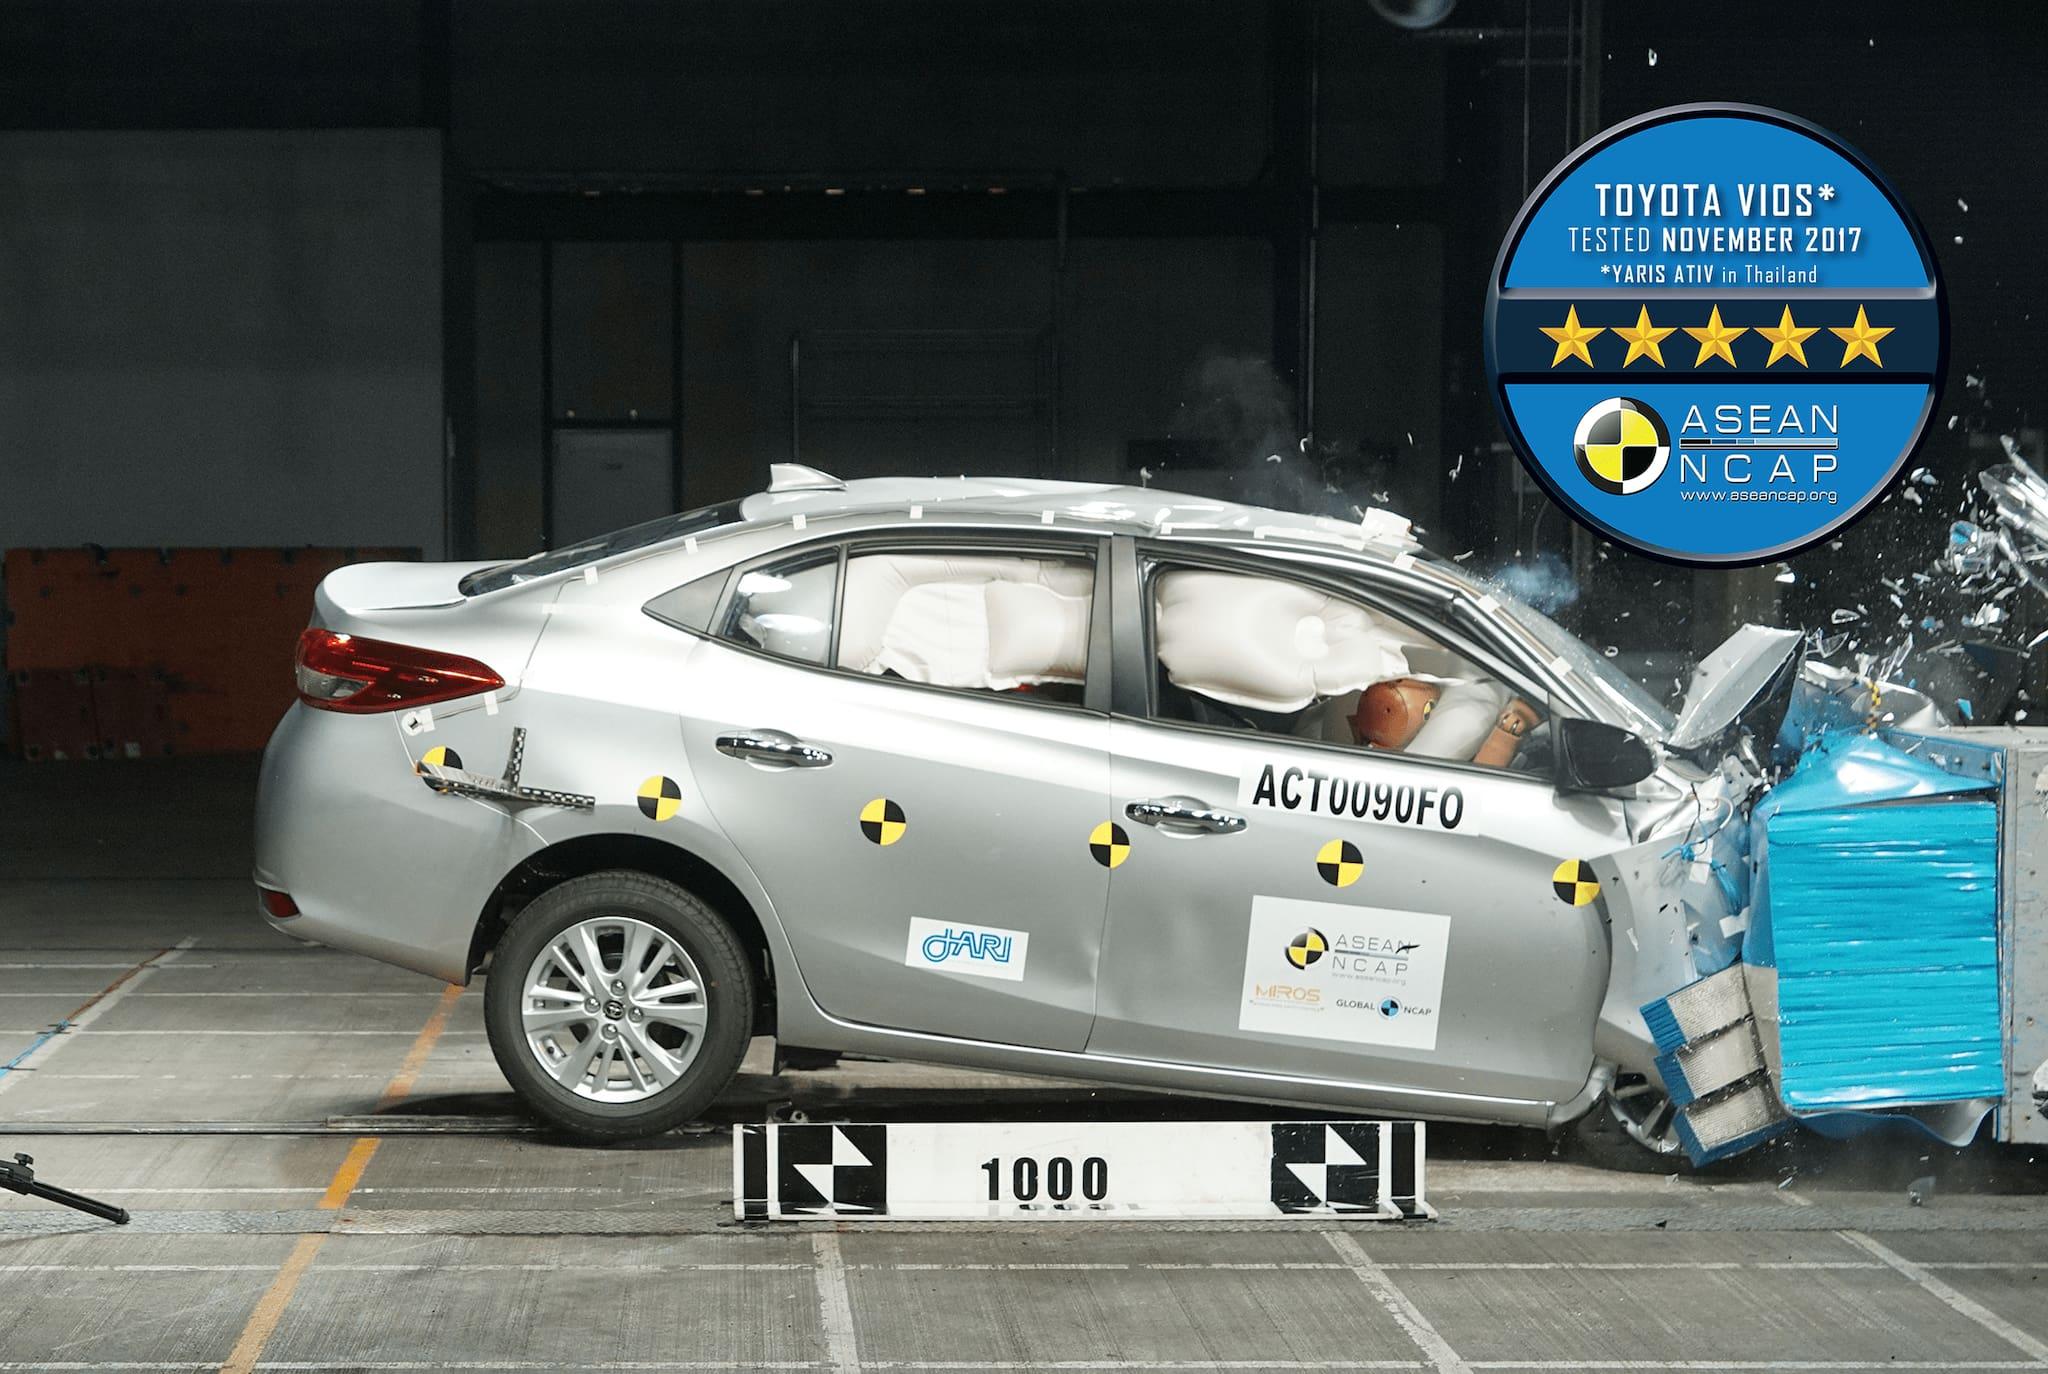 All-New Toyota Vios Scores 5-Star ASEAN NCAP Rating